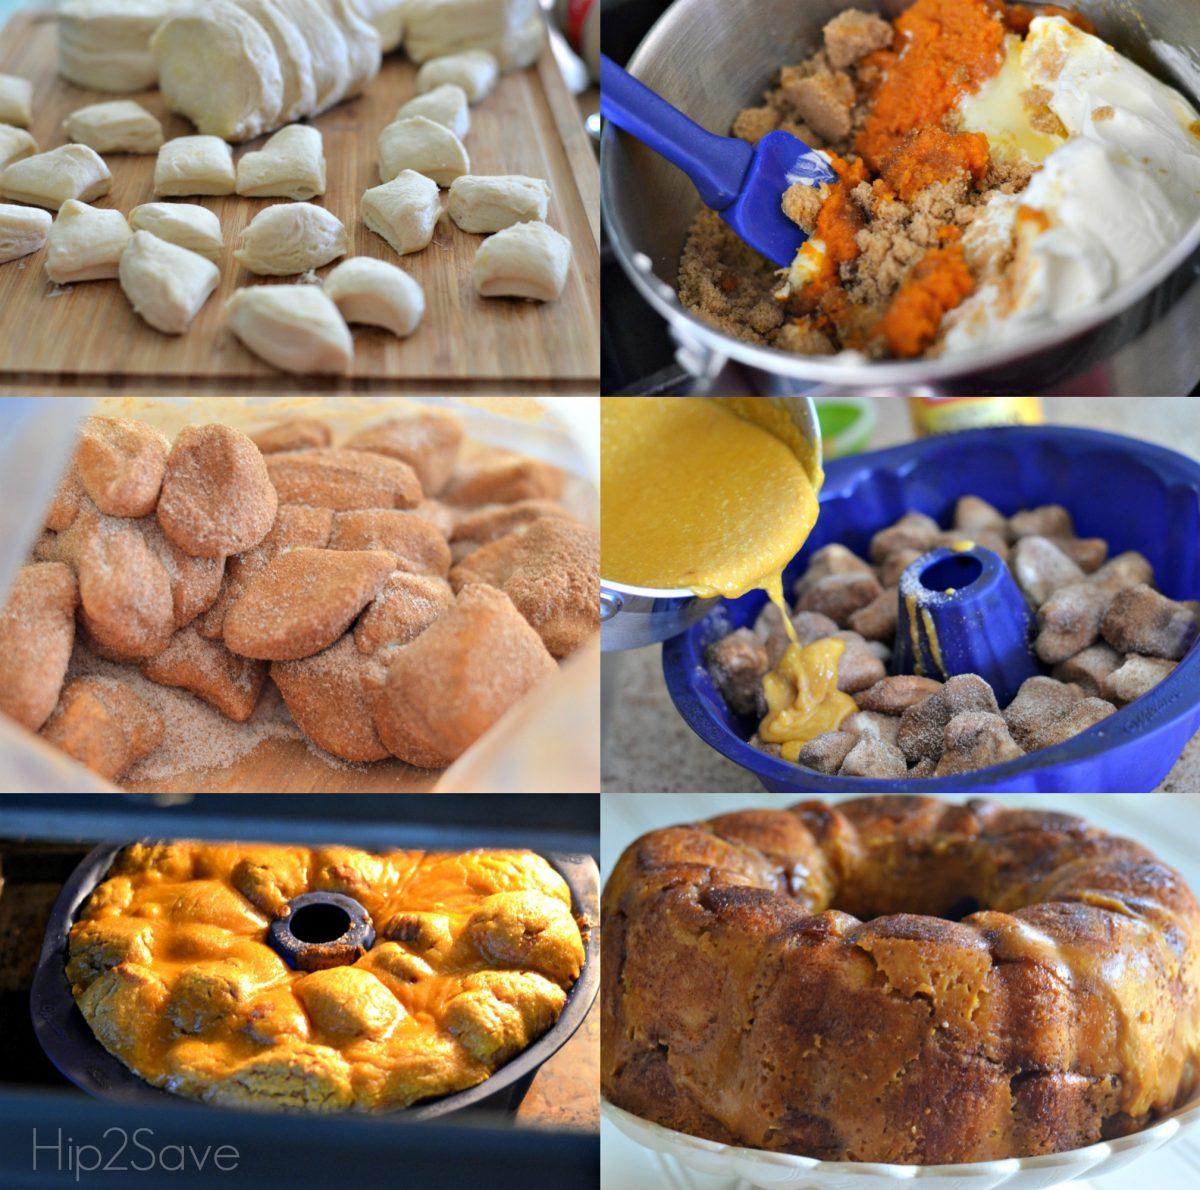 How to Make Monkey Bread Hip2Save.com